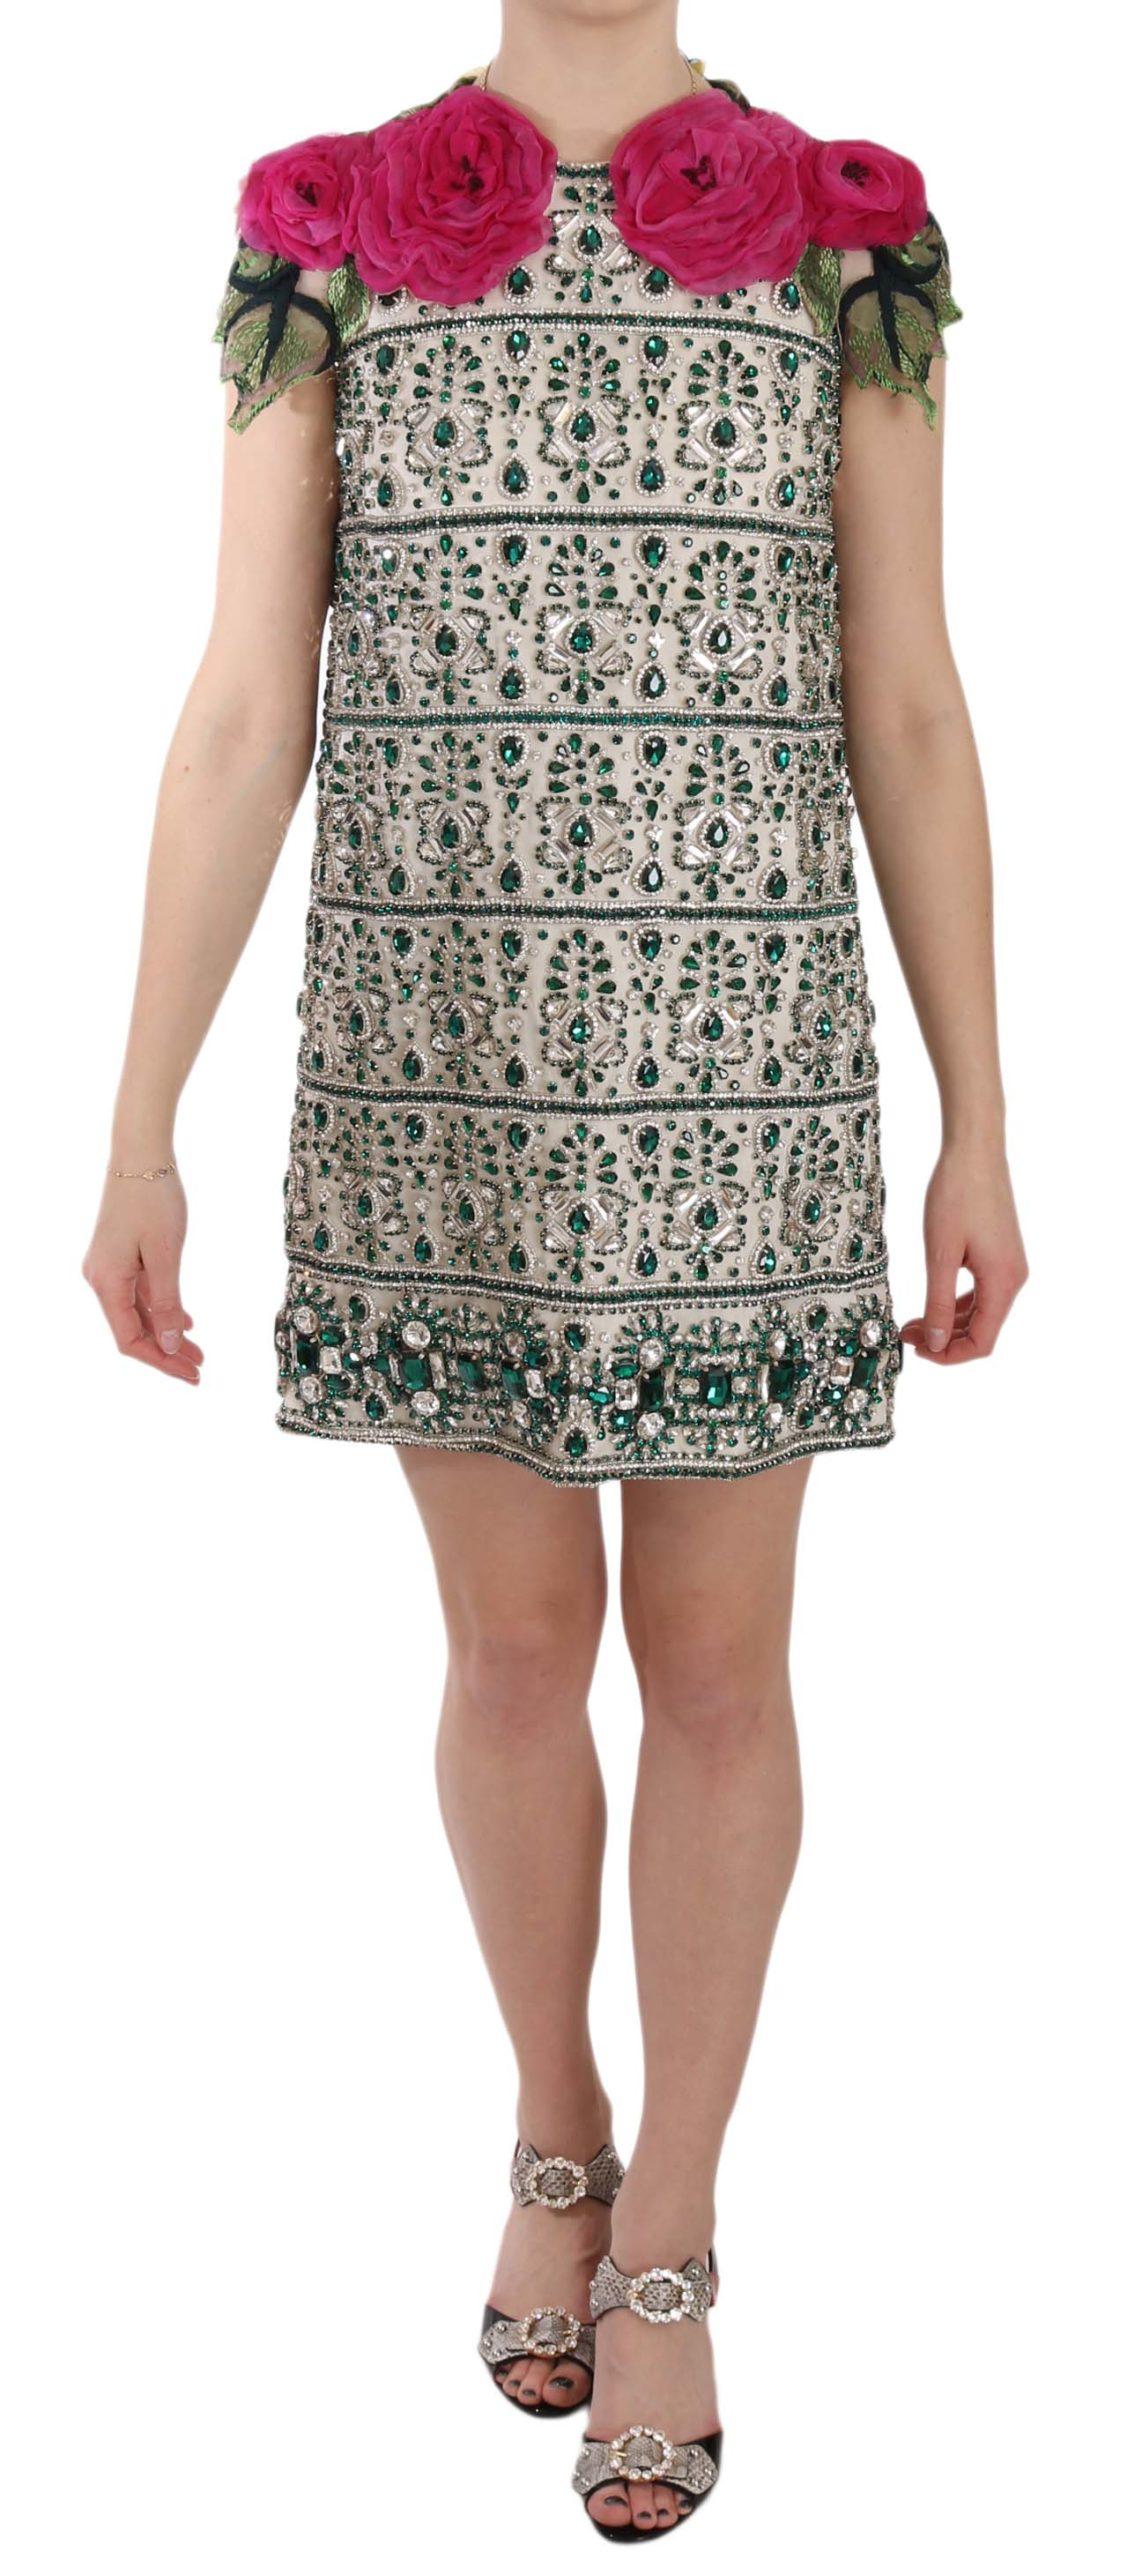 Dolce & Gabbana Women's Crystal Jewel Floral Sleeves Mini Dress Beige DR1624 - IT38   S